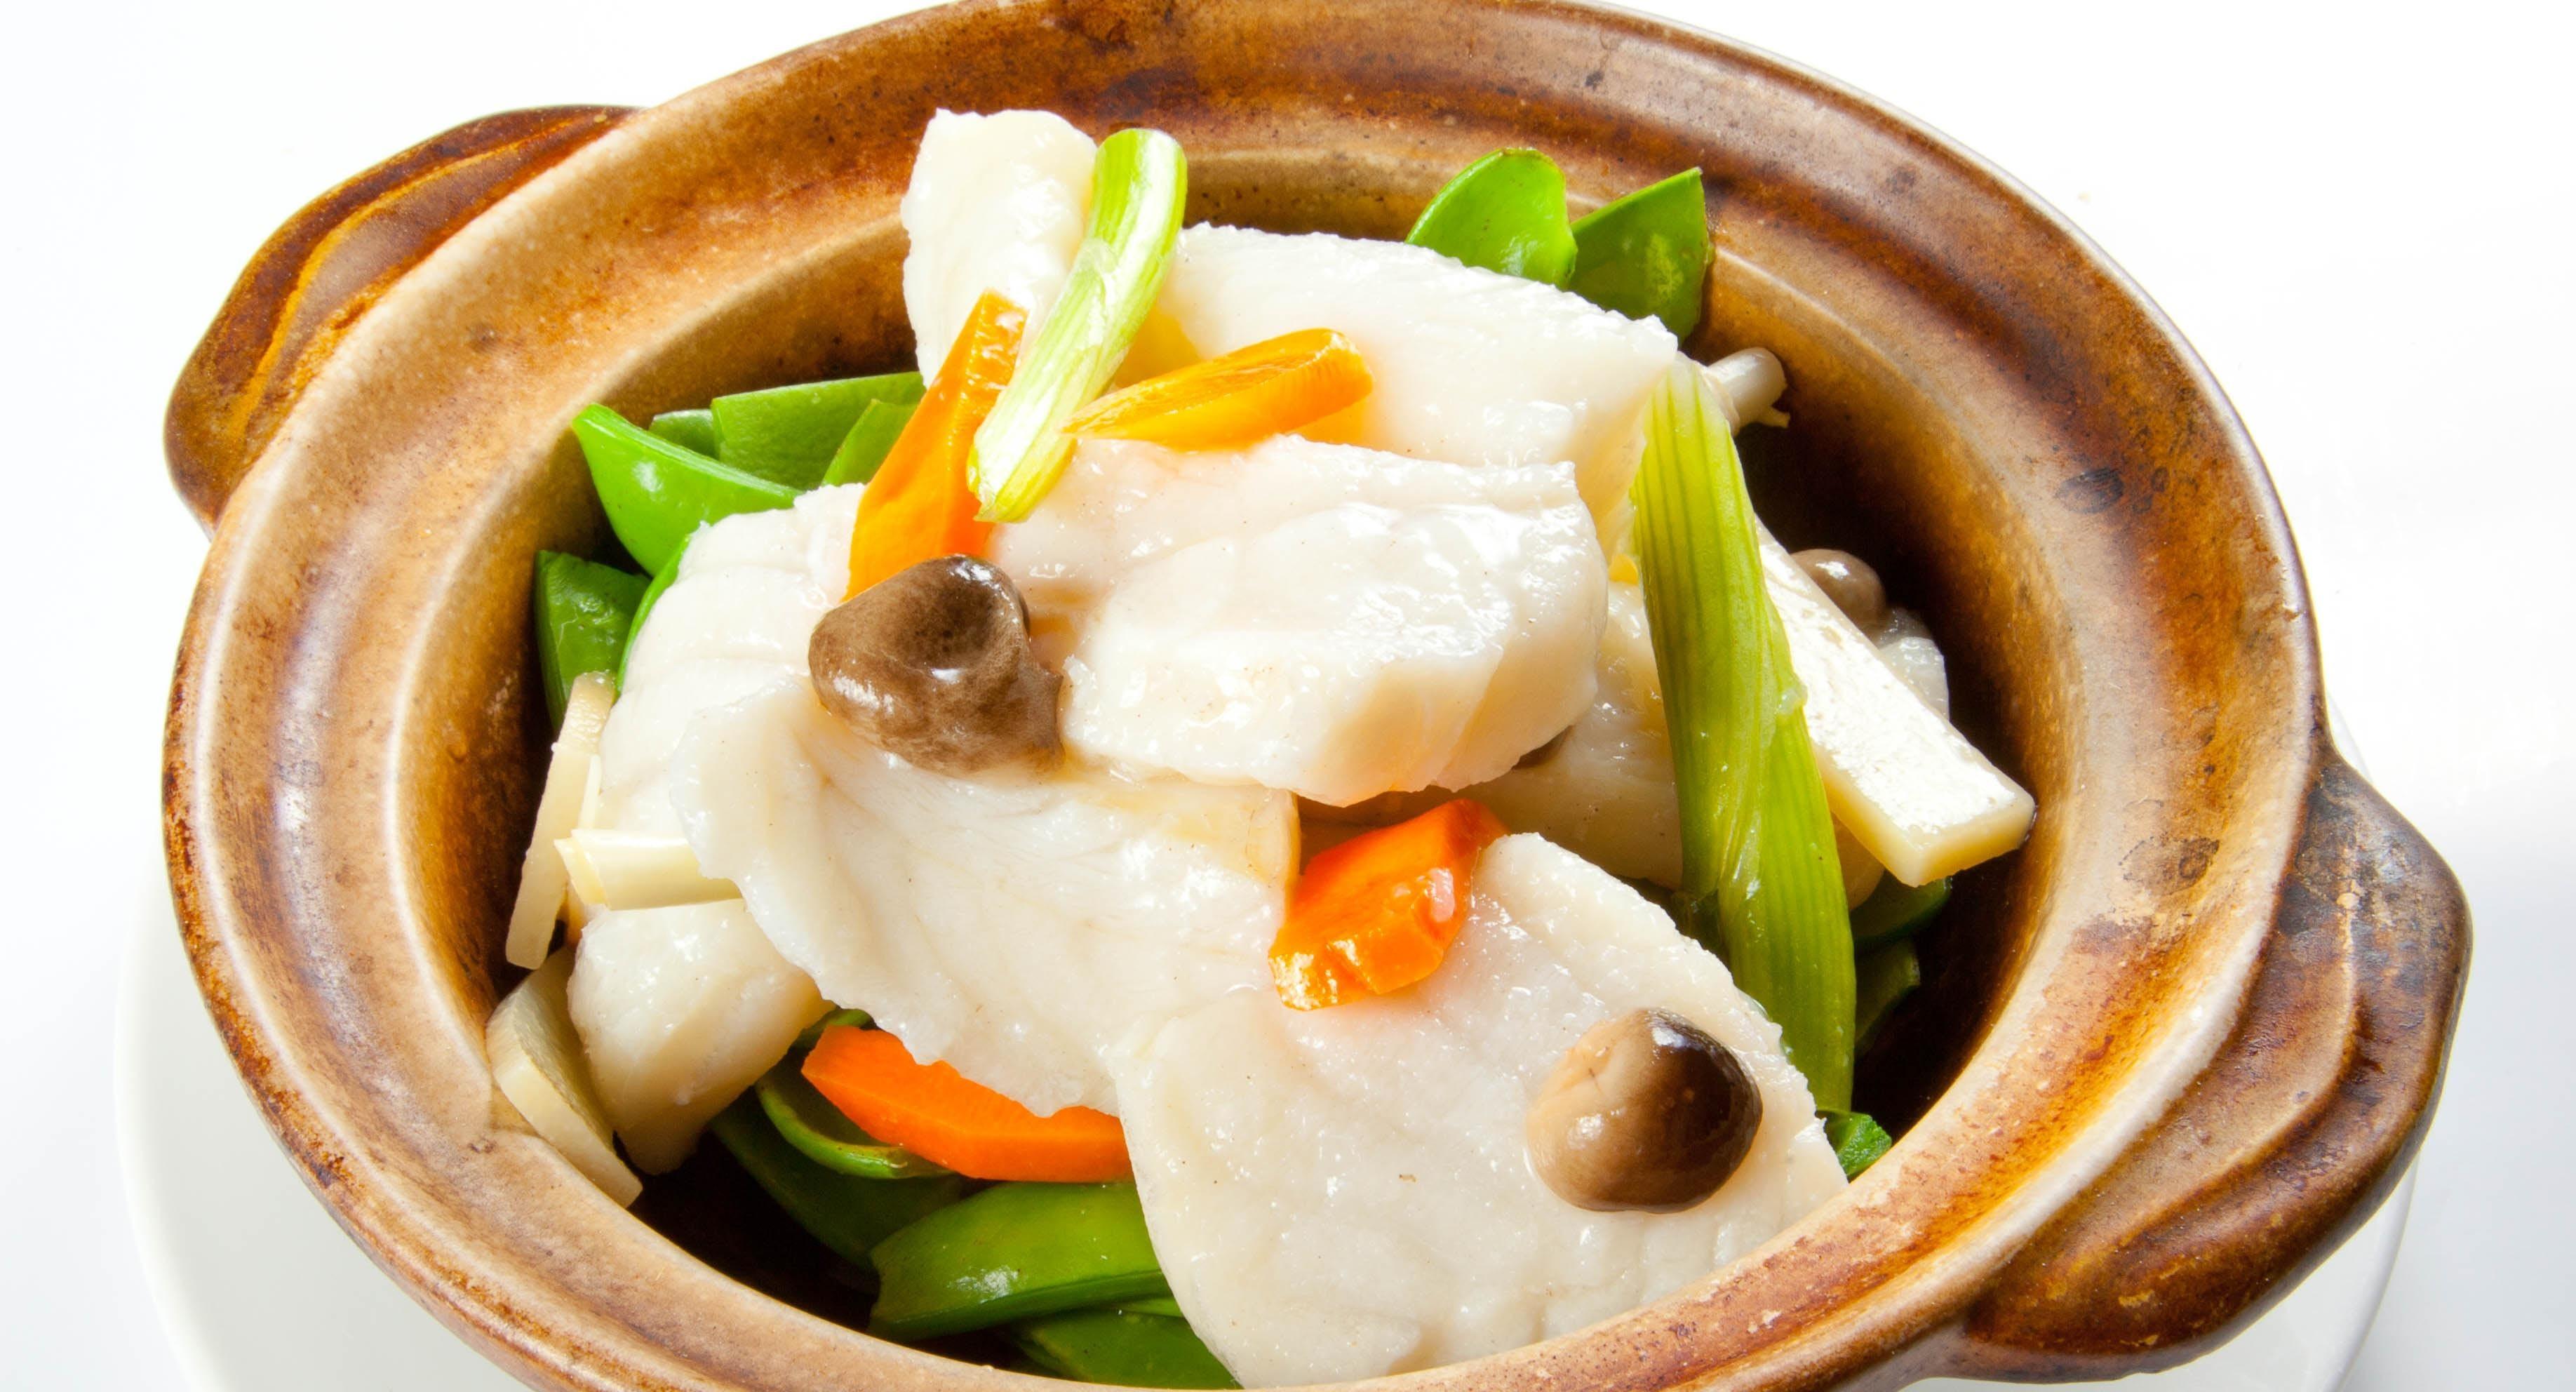 Unique Asian Cuisine & Bar